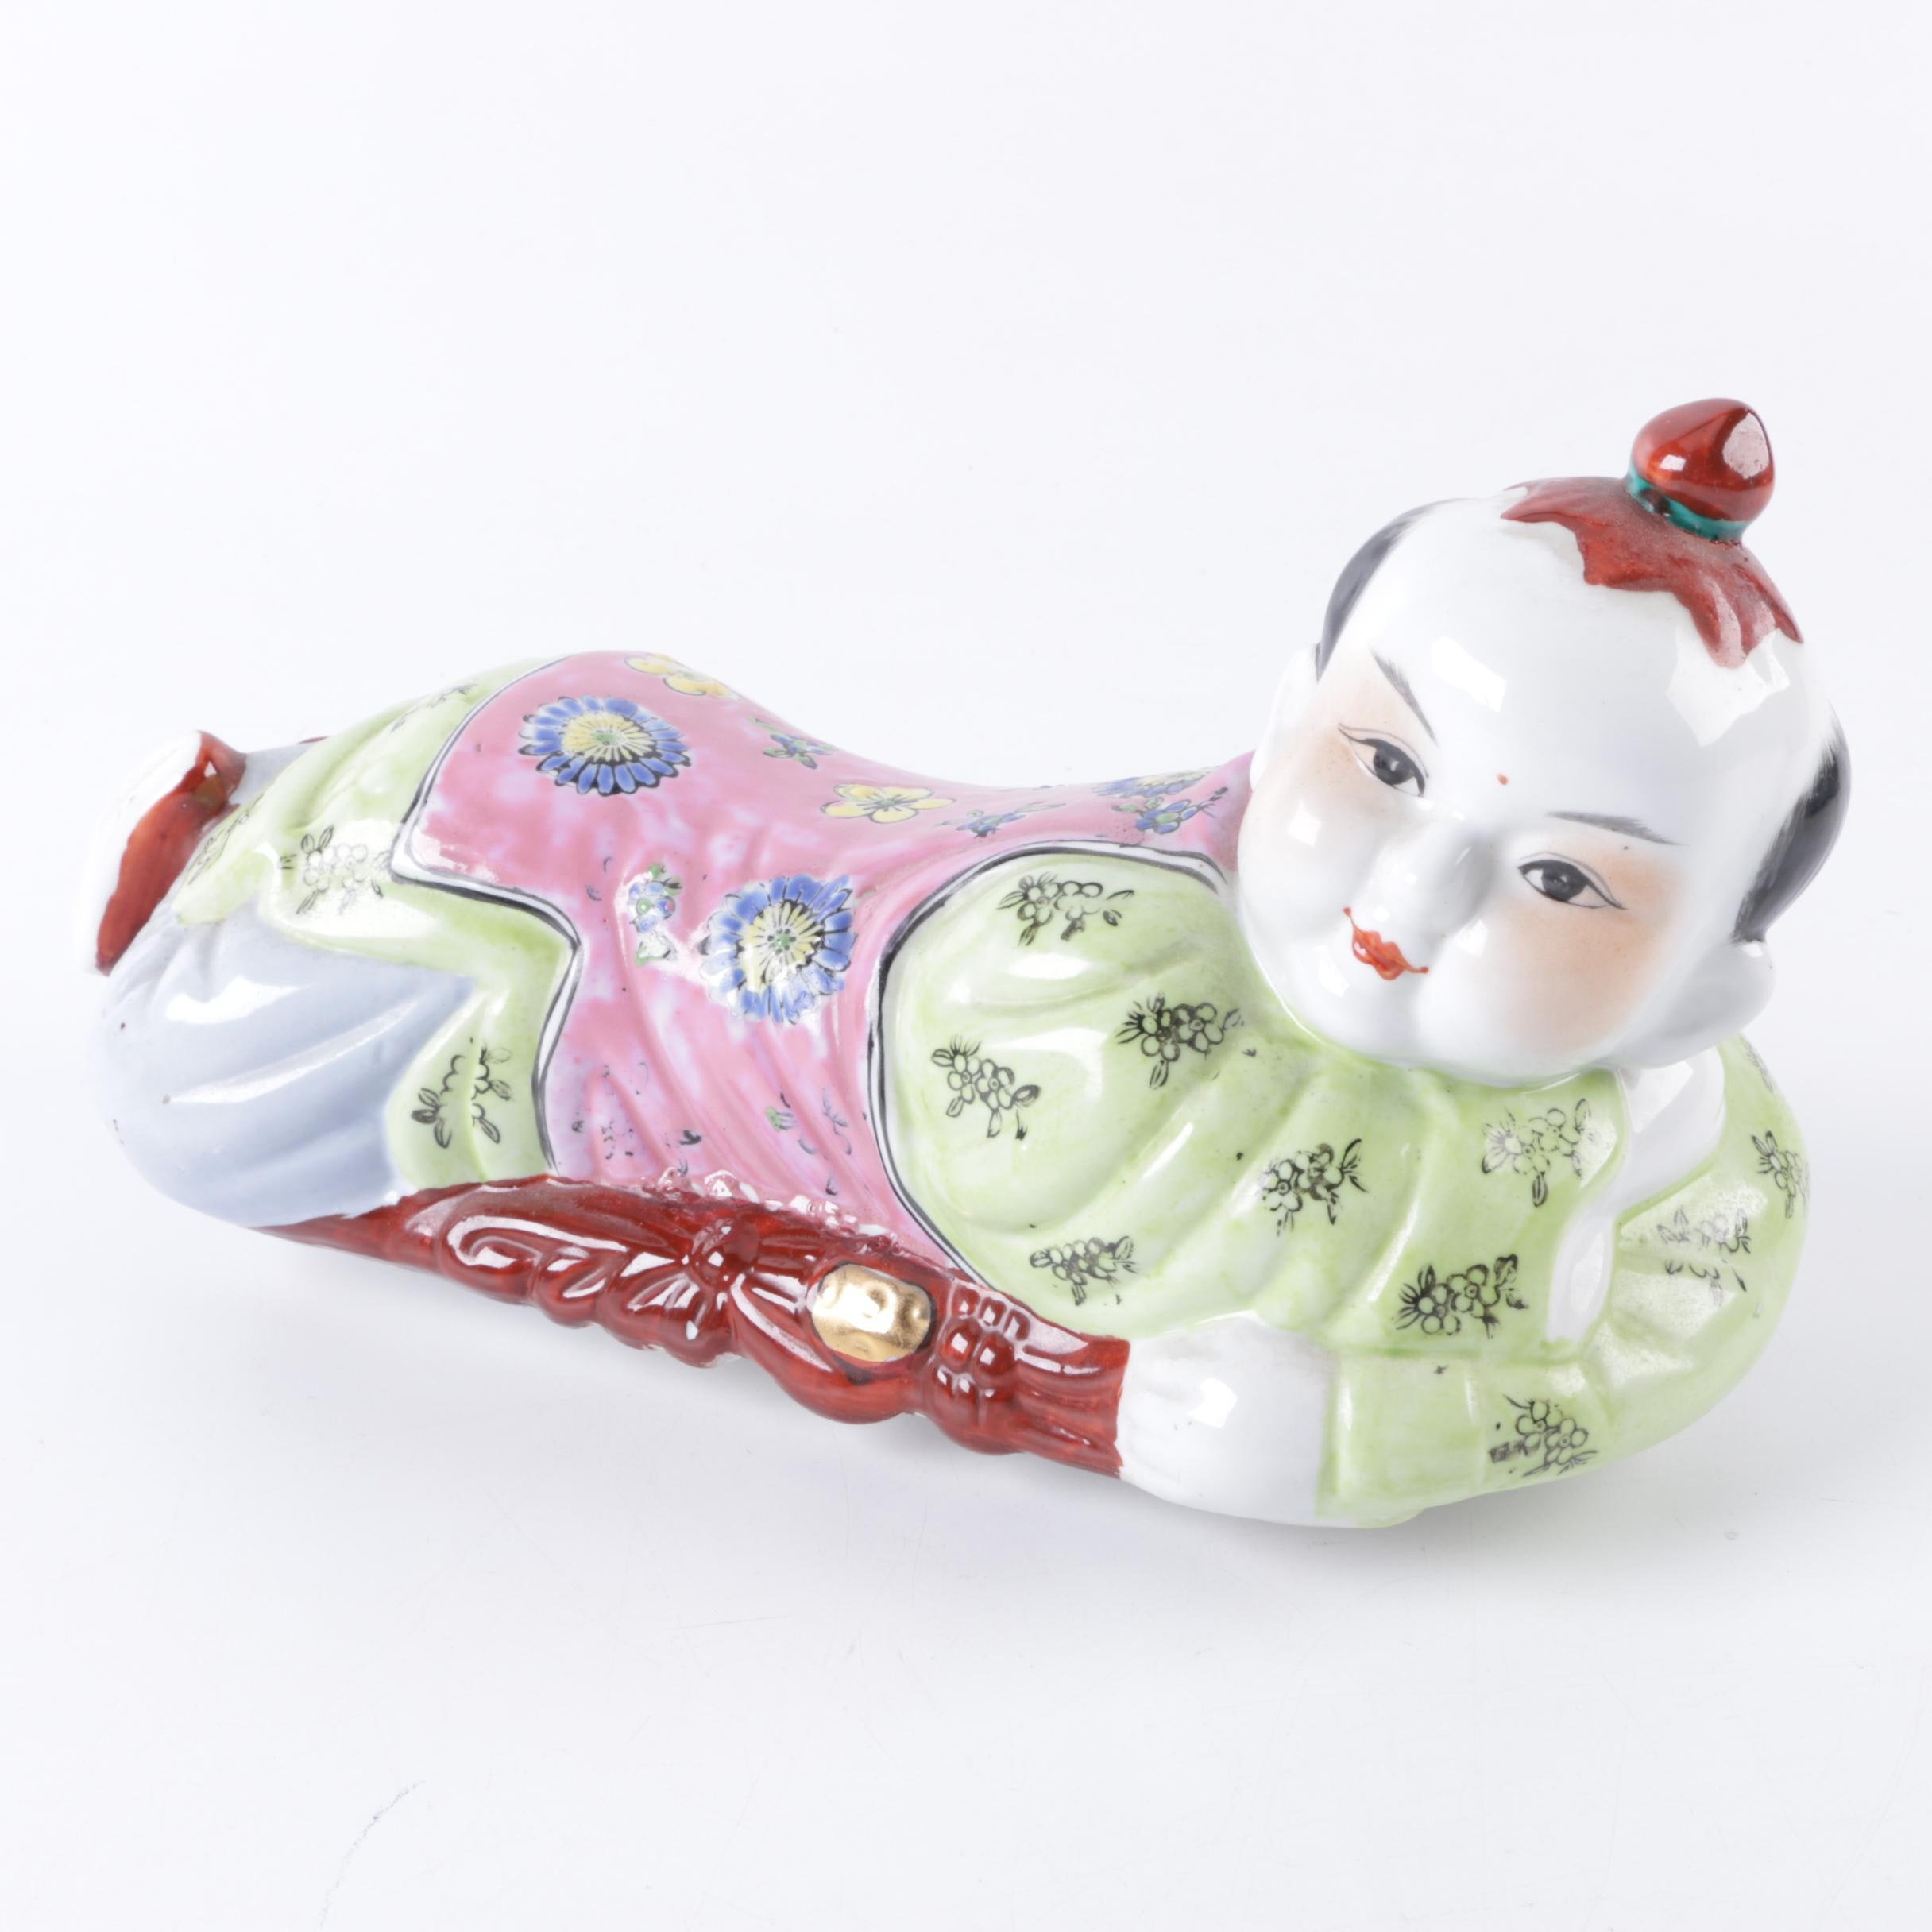 Vintage East Asian Ceramic Stash Box